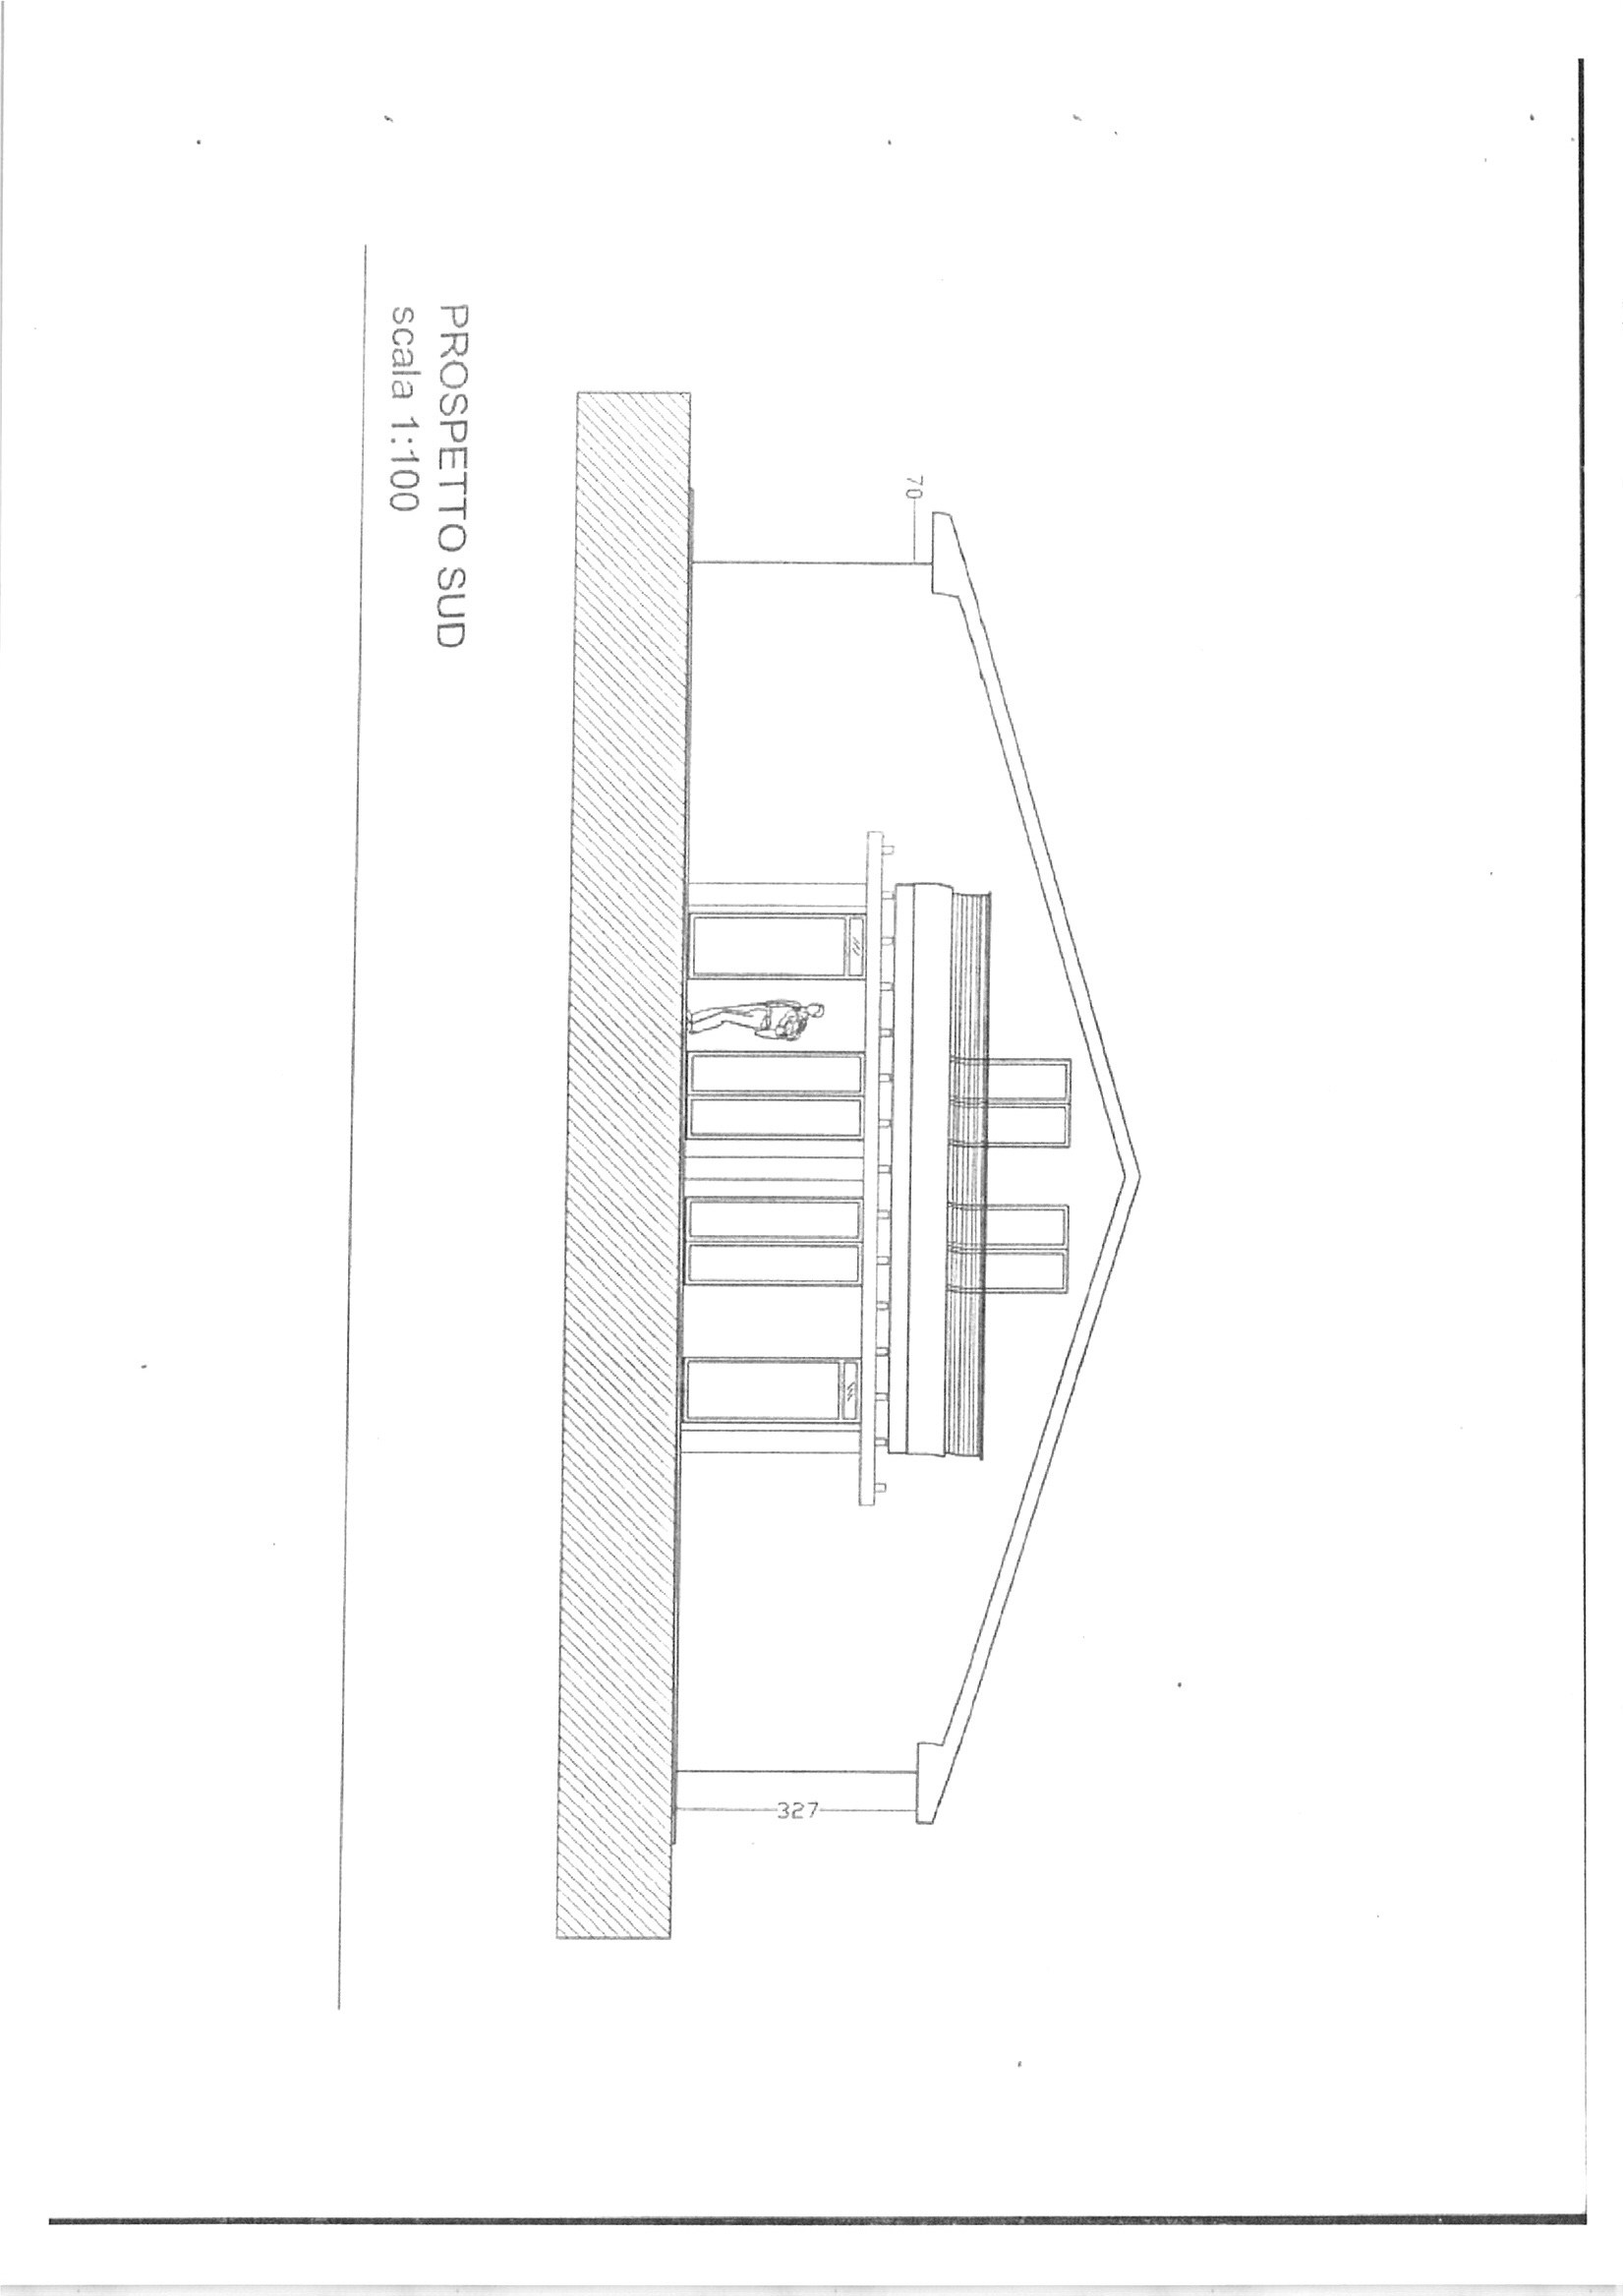 Planimetria 5/5 per rif. vbf lamm 160